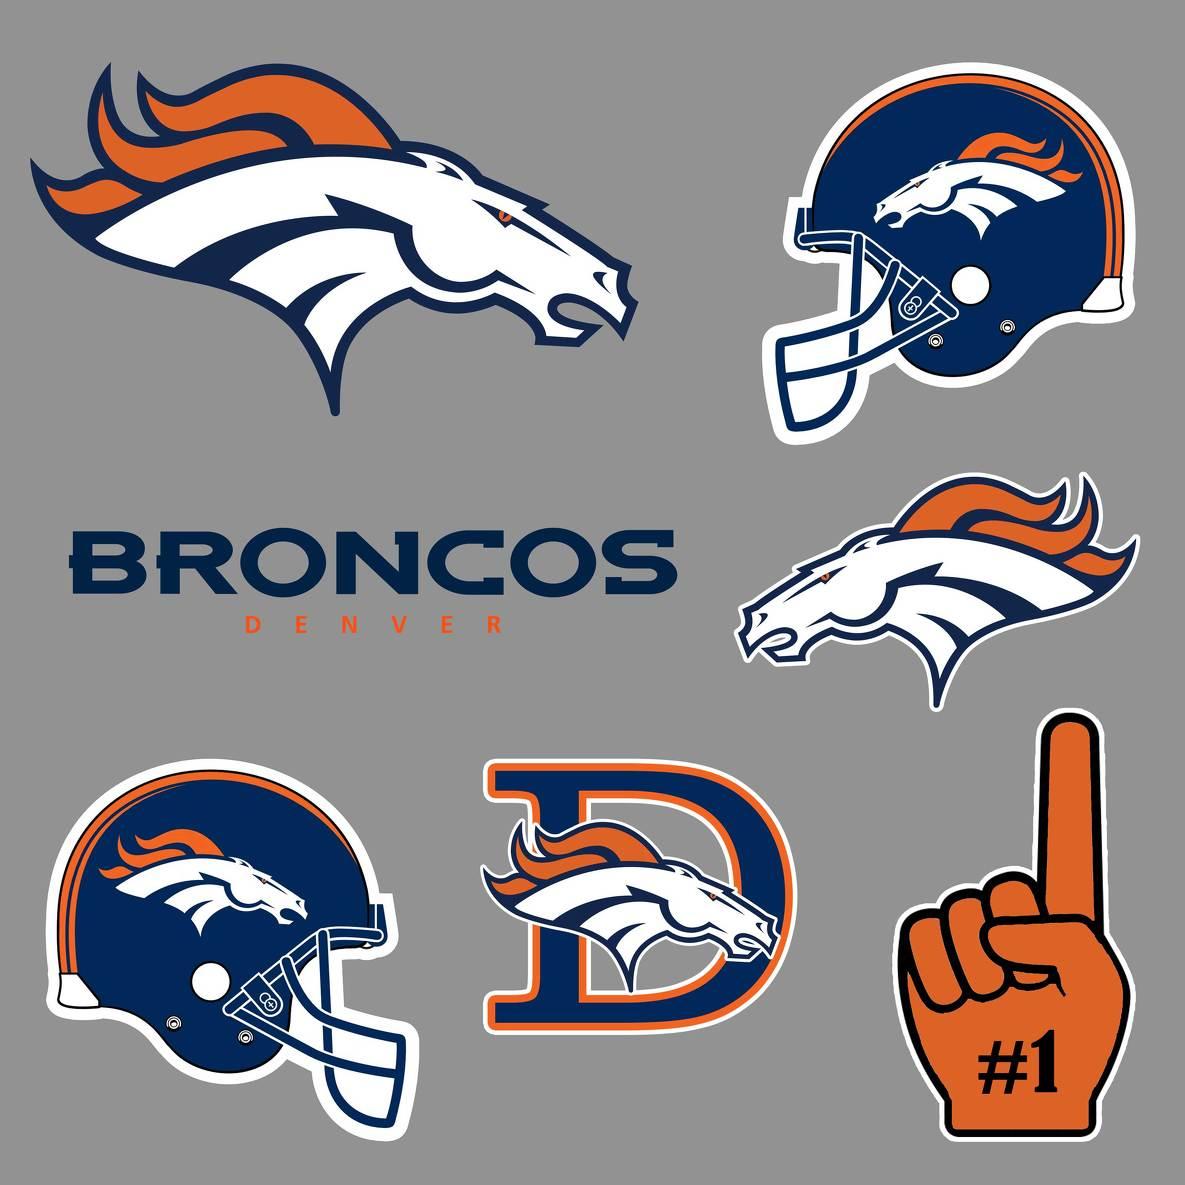 Denver Nn: Product: Denver Broncos Professional American Football